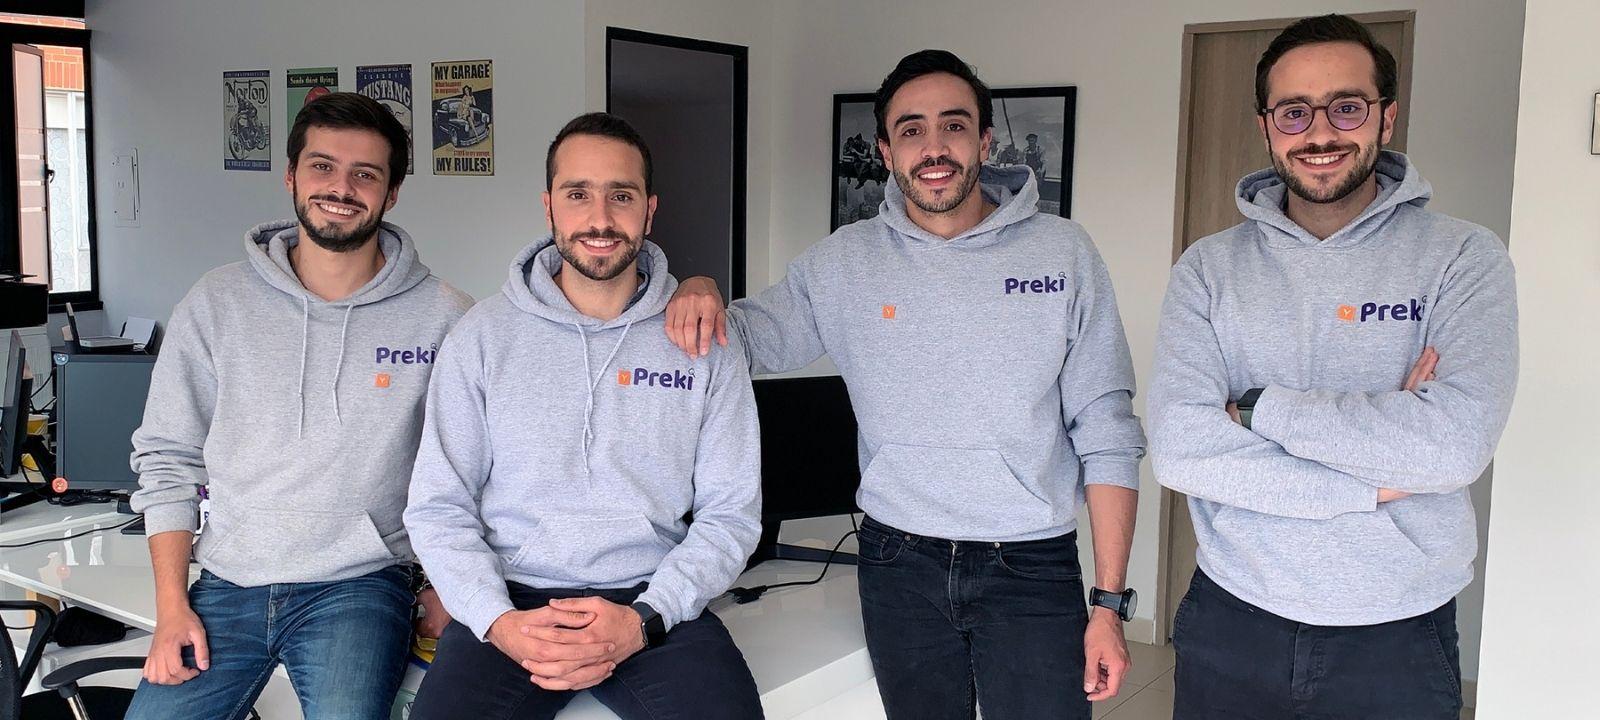 Integrantes de Preki, la start-up seleccionada por Ycombinator